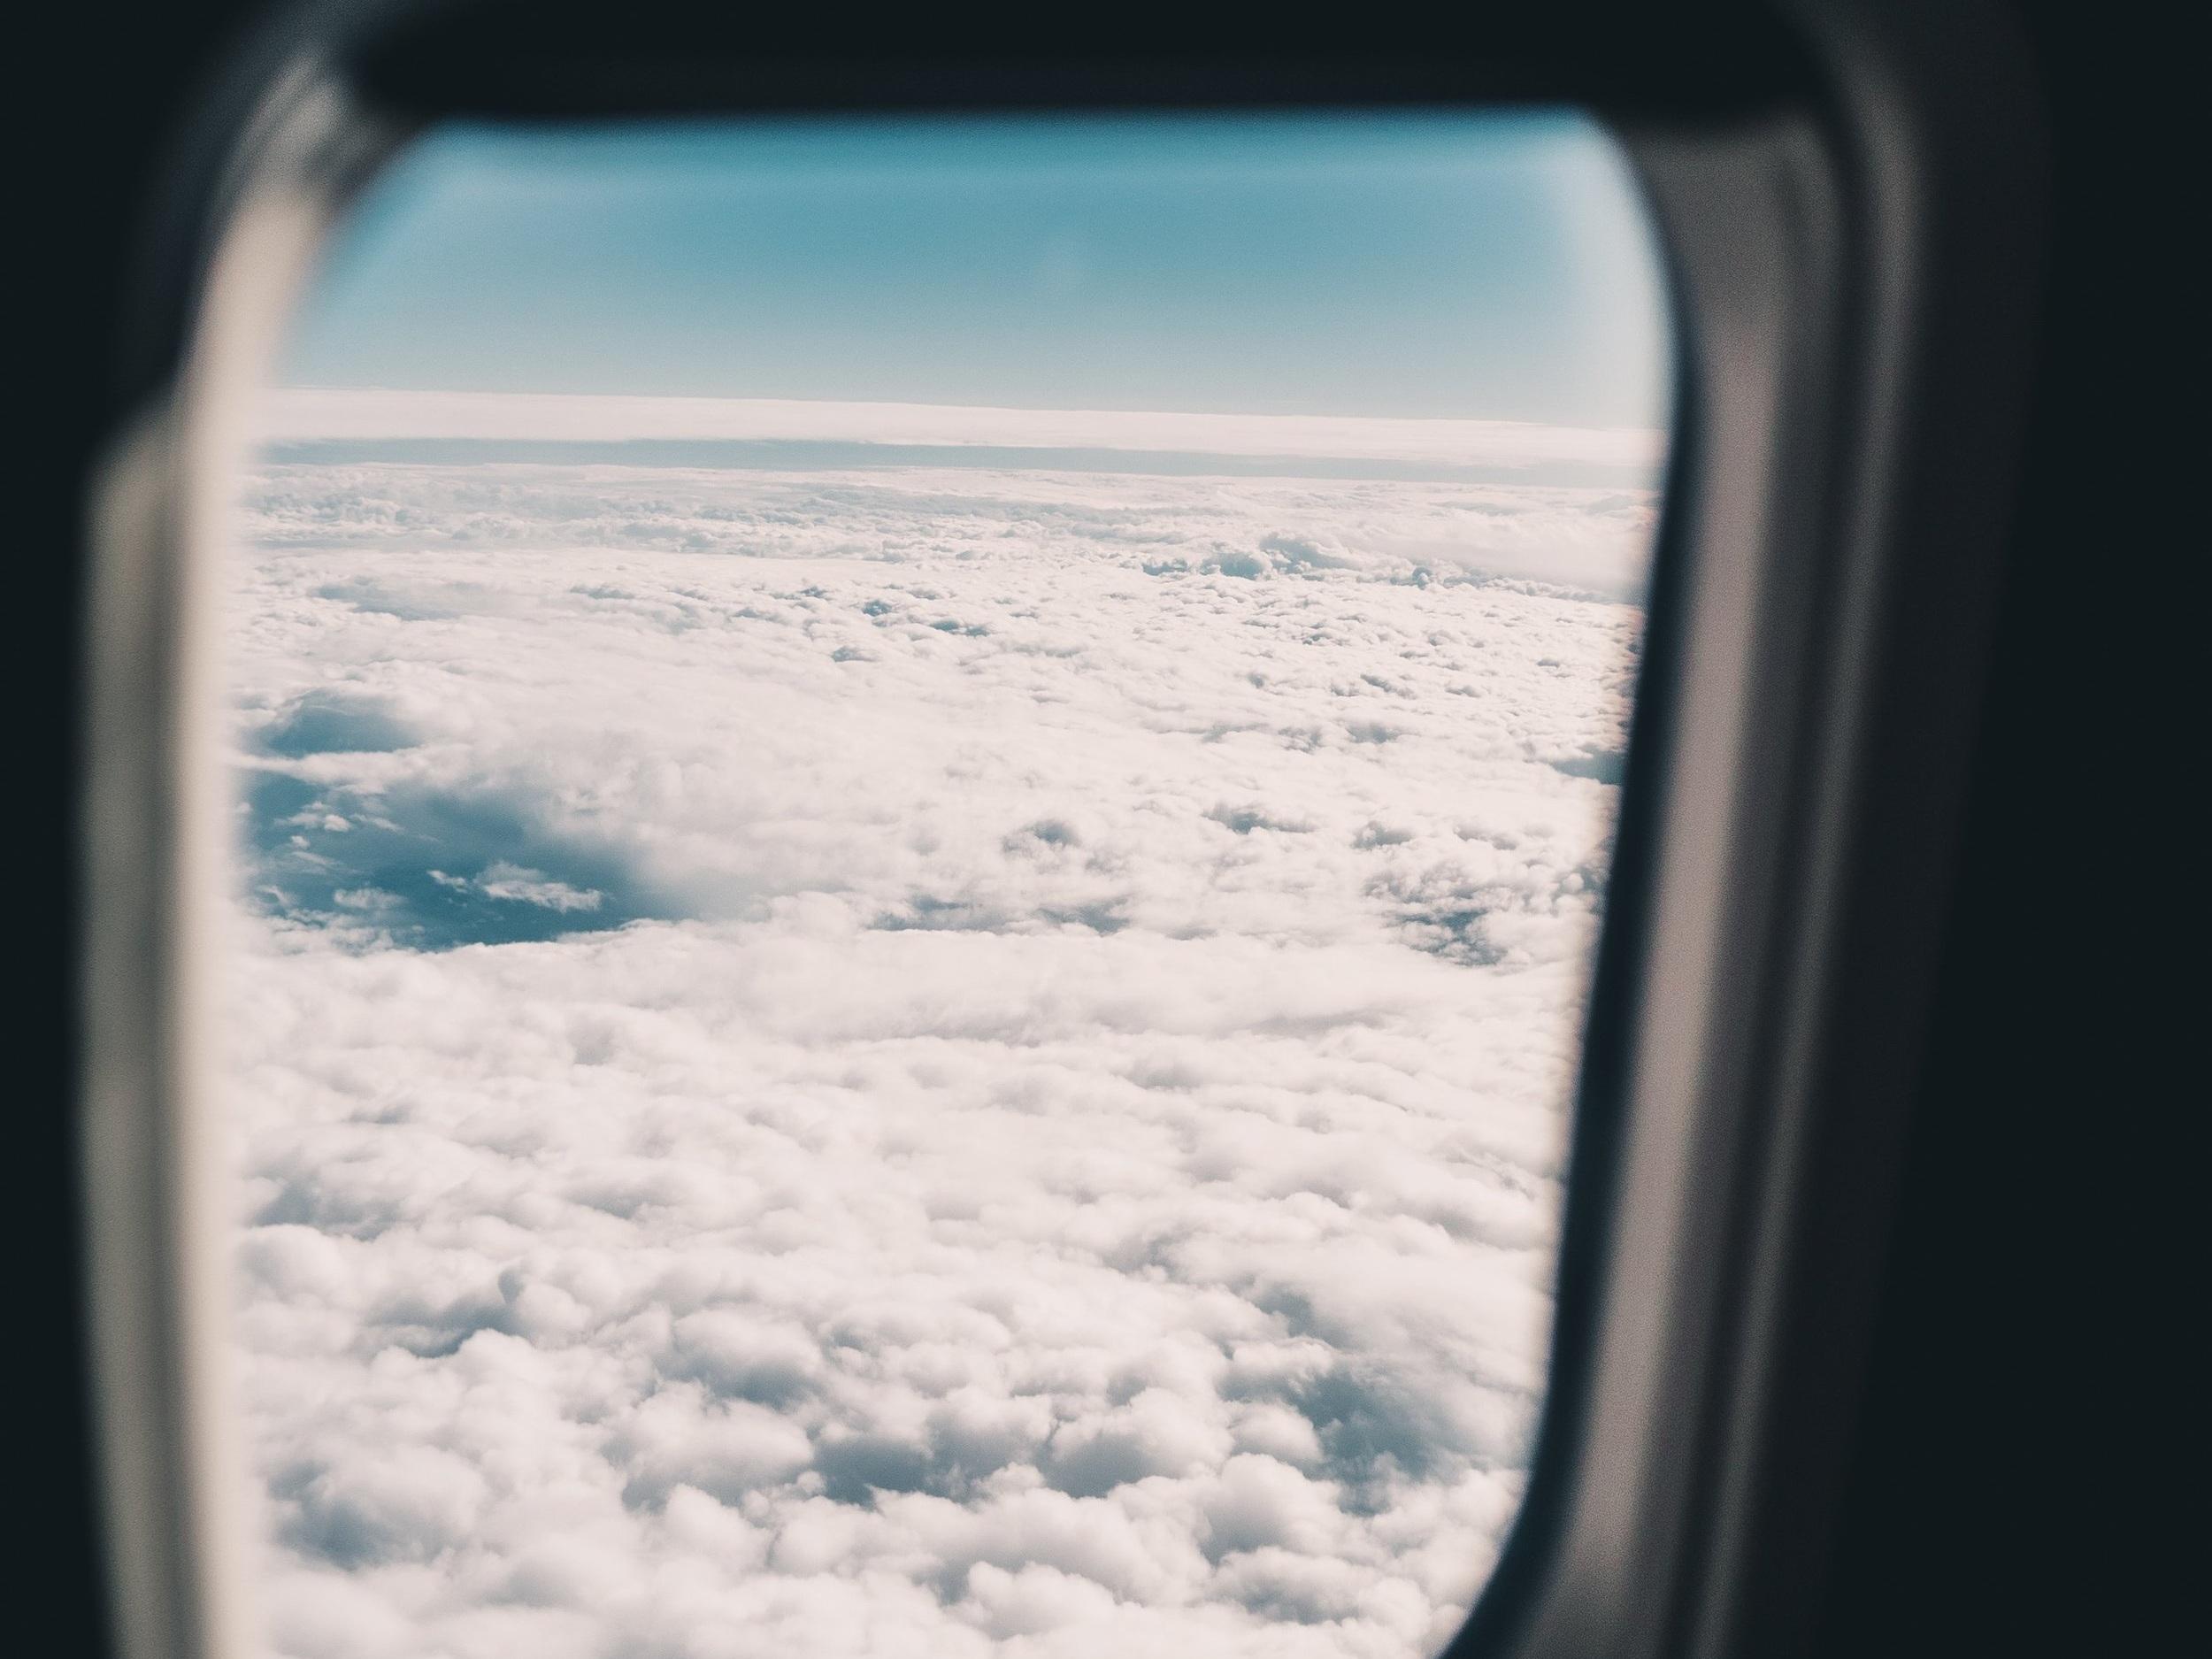 Somewhere in the sky. (Unsplash)